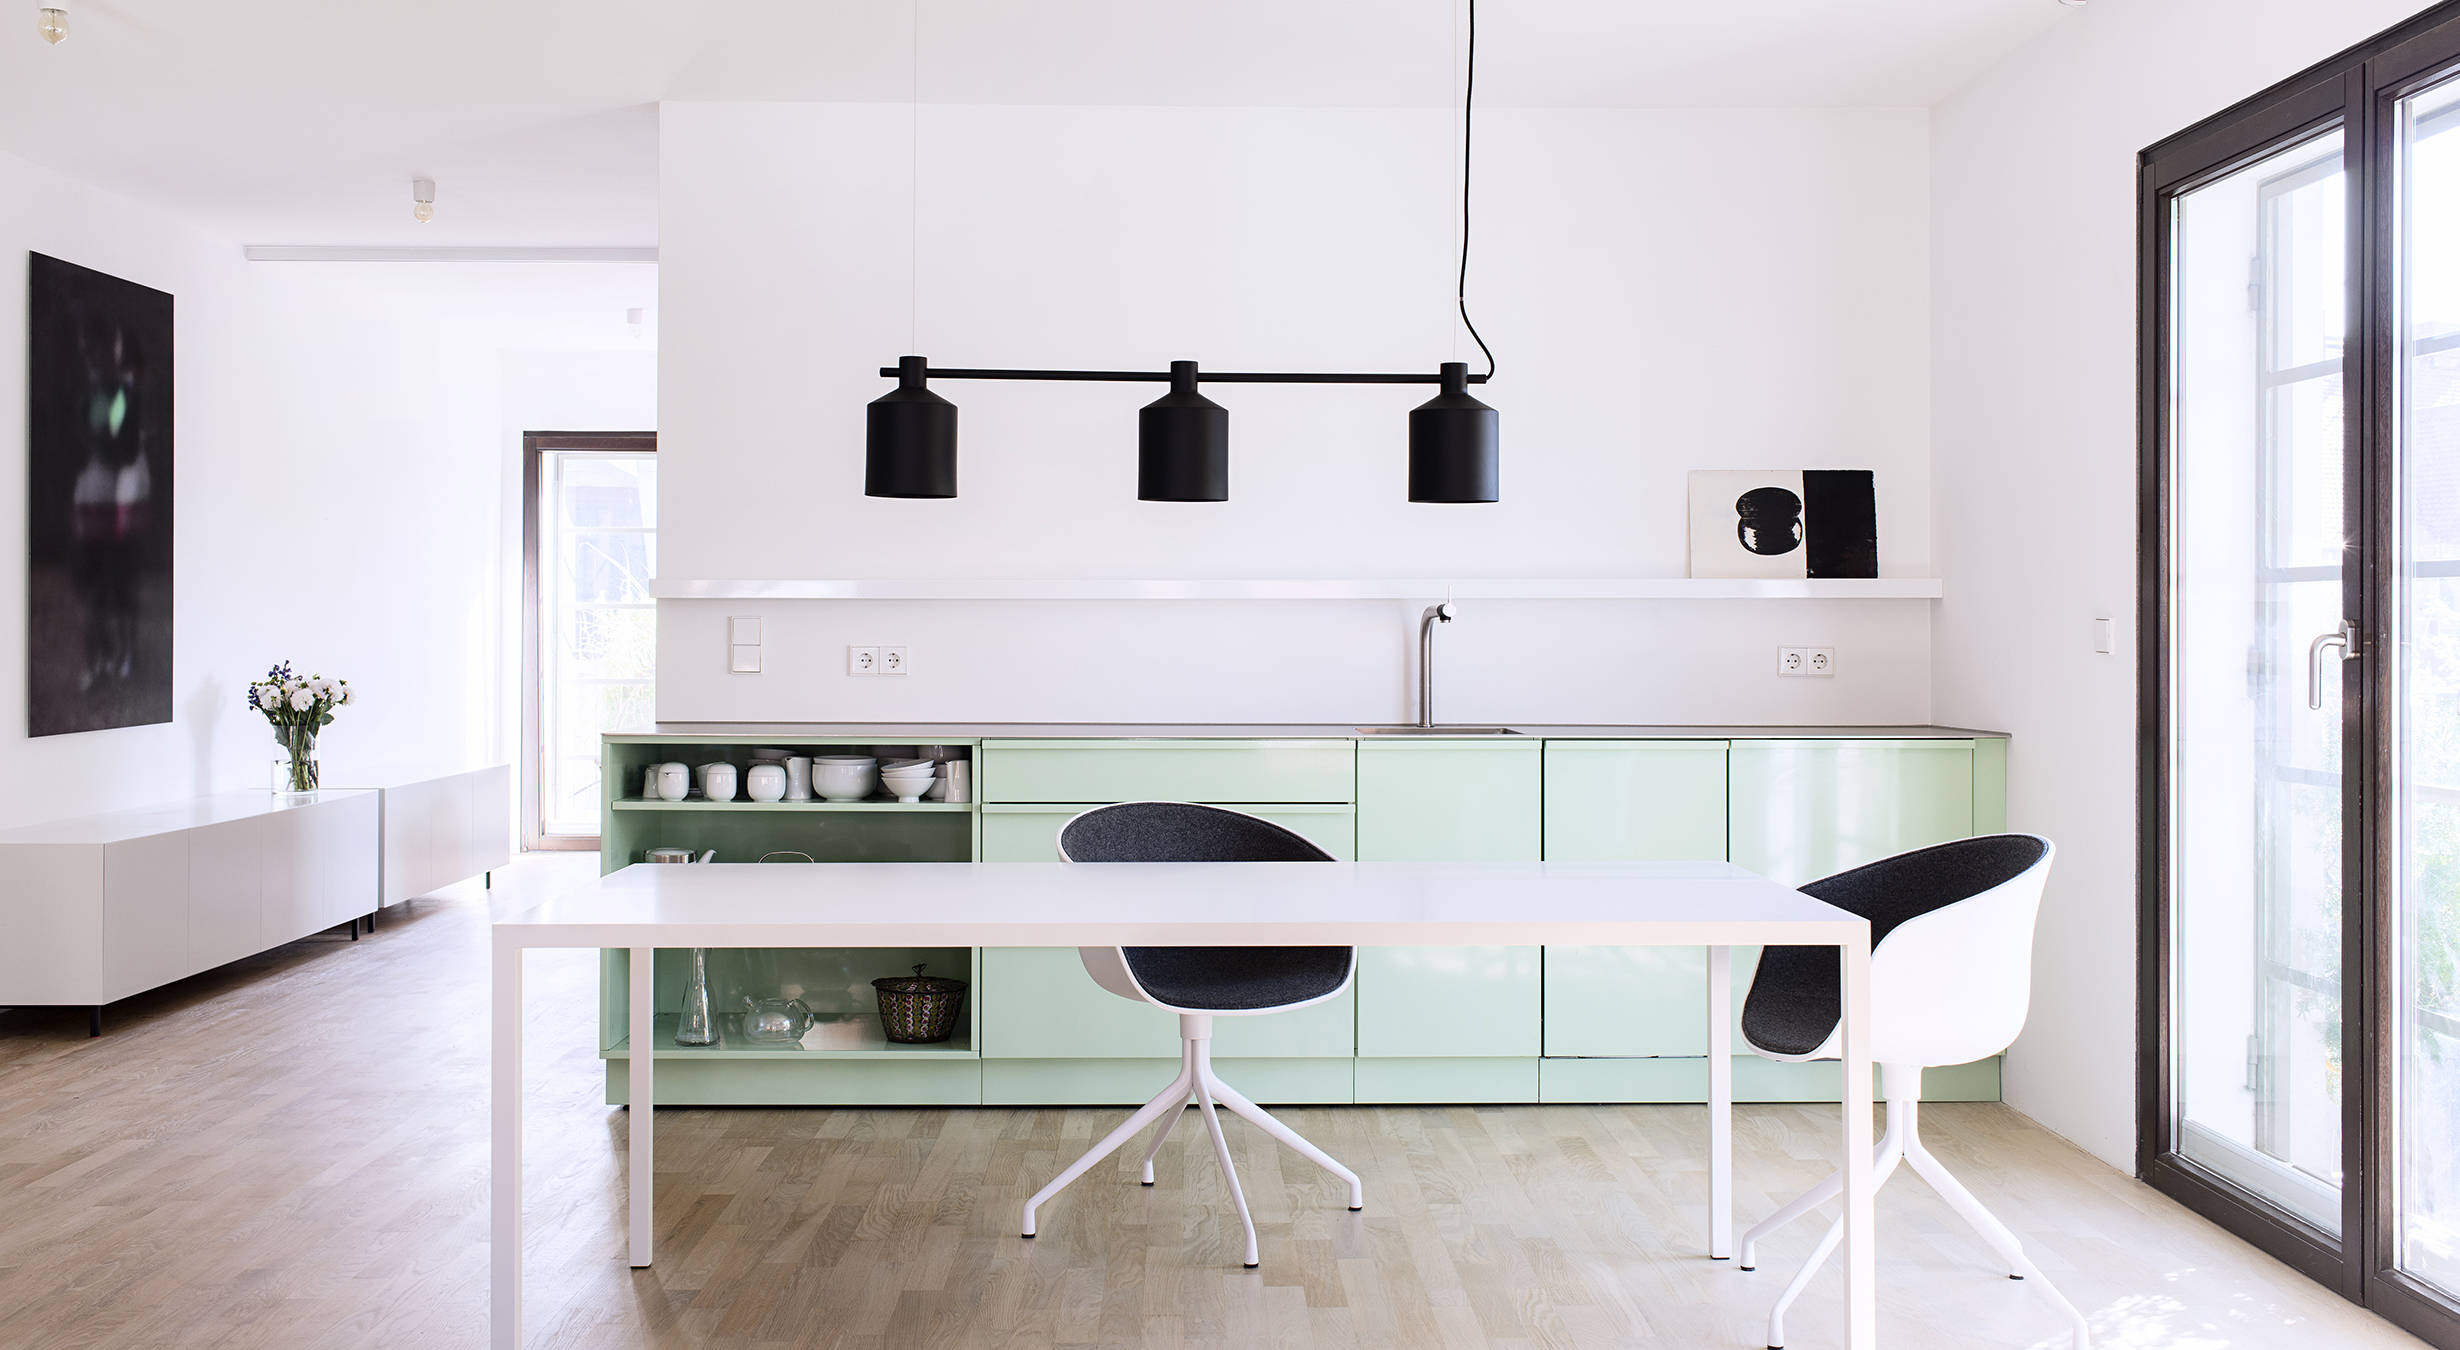 Full Size of Büro Küche Dreckig Büro Küche Verschließbar Büro Küche Abverkauf Inone Büroküche Küche Büroküche